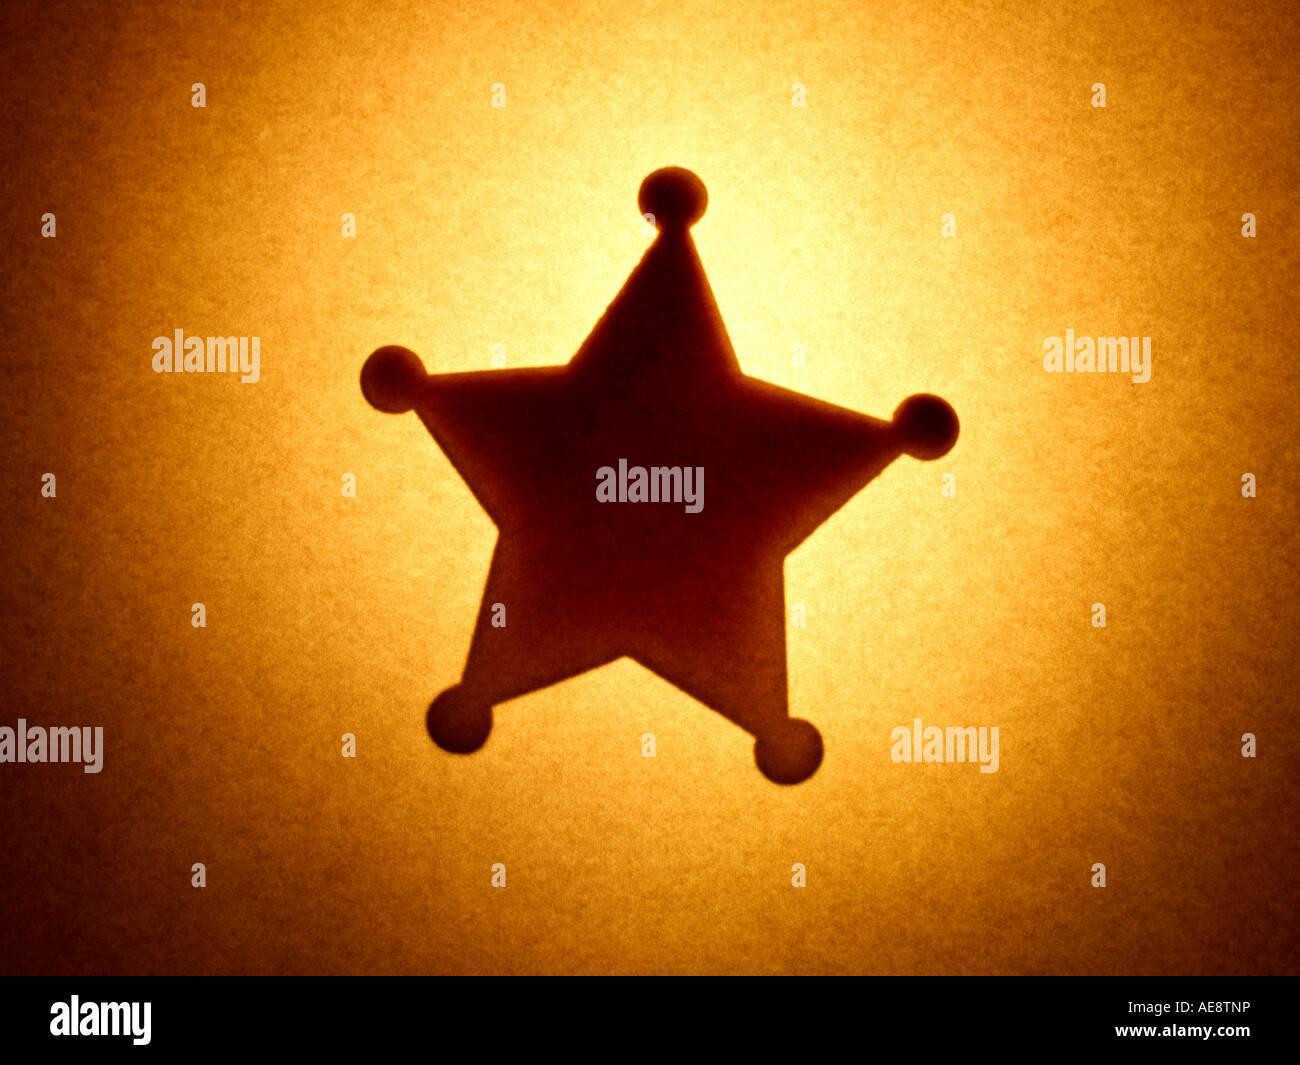 Sheriff Star Imágenes De Stock & Sheriff Star Fotos De